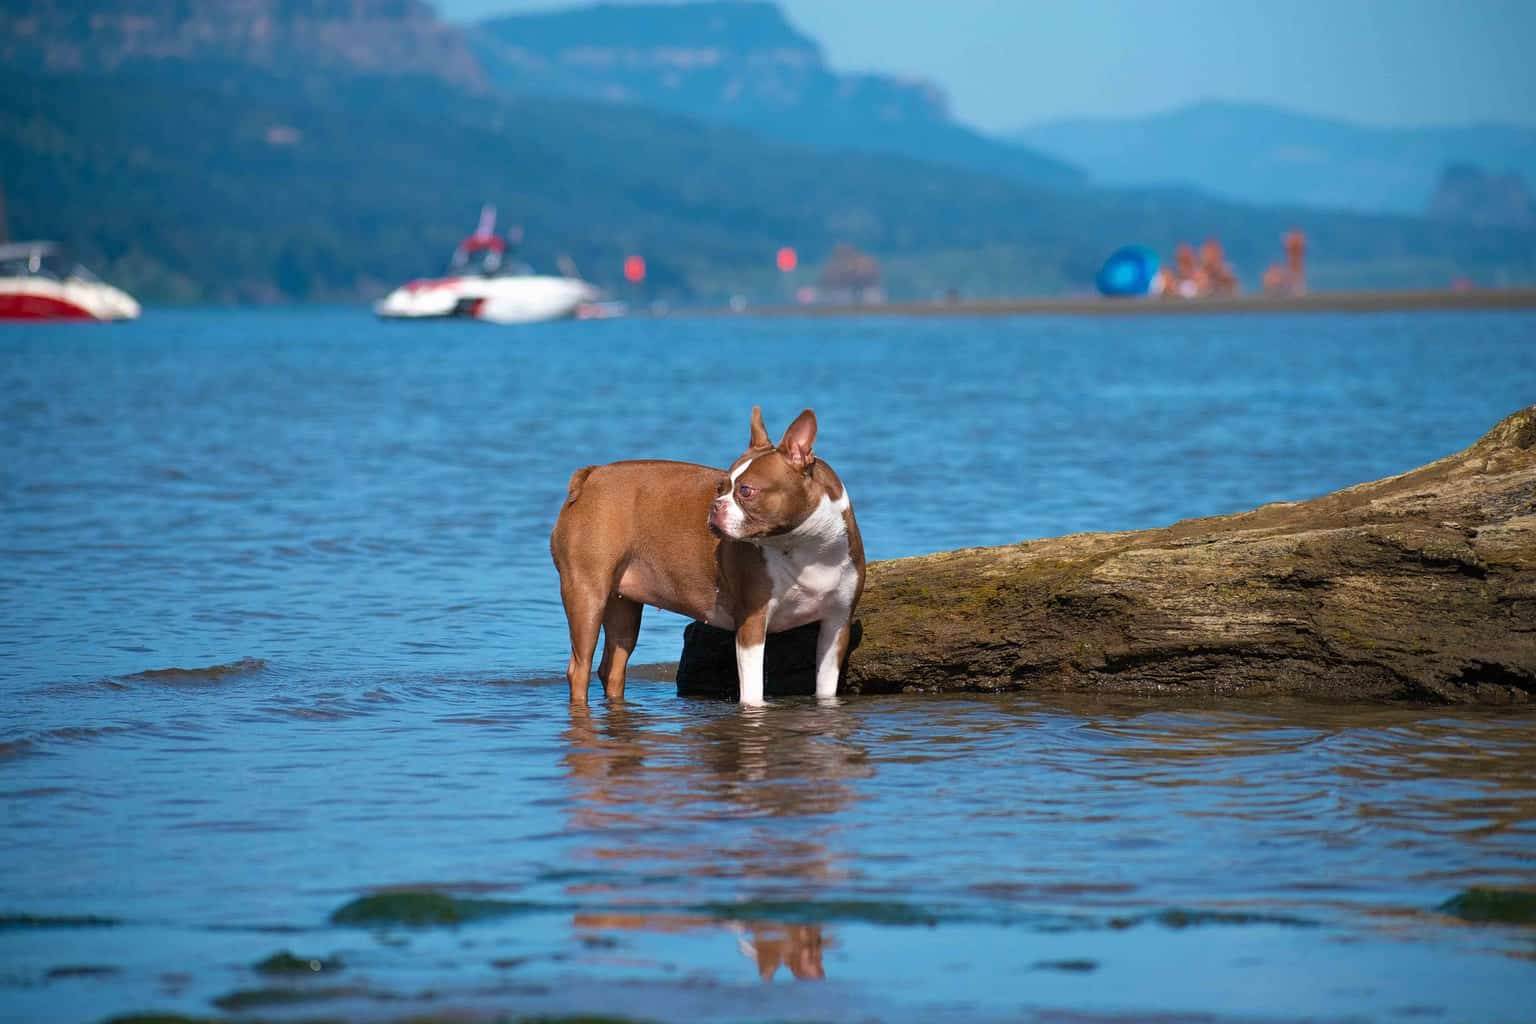 Boston Terrier going for a swim in the ocean